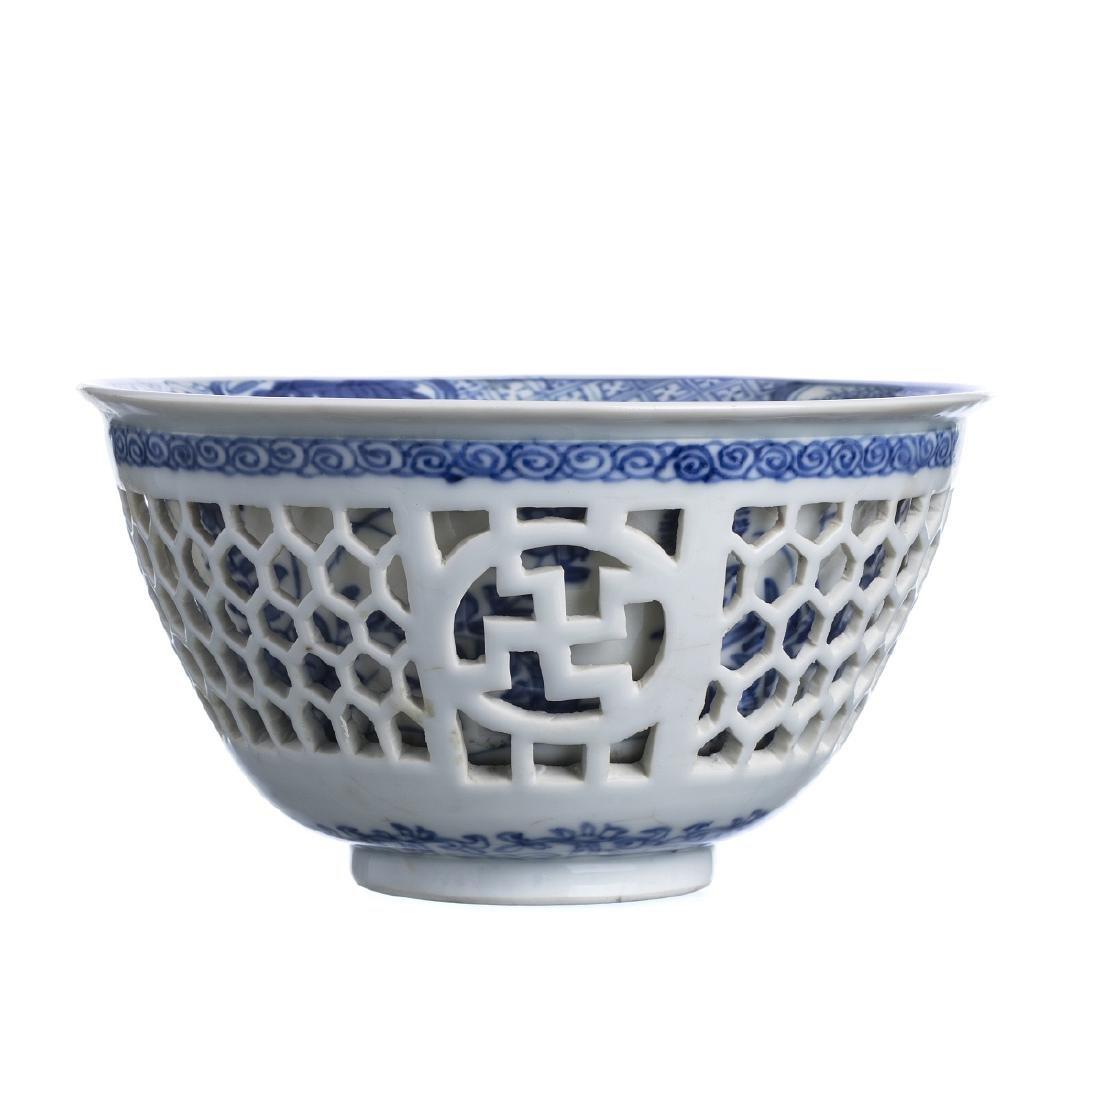 Chinese porcelain double walled bowl, Kangxi